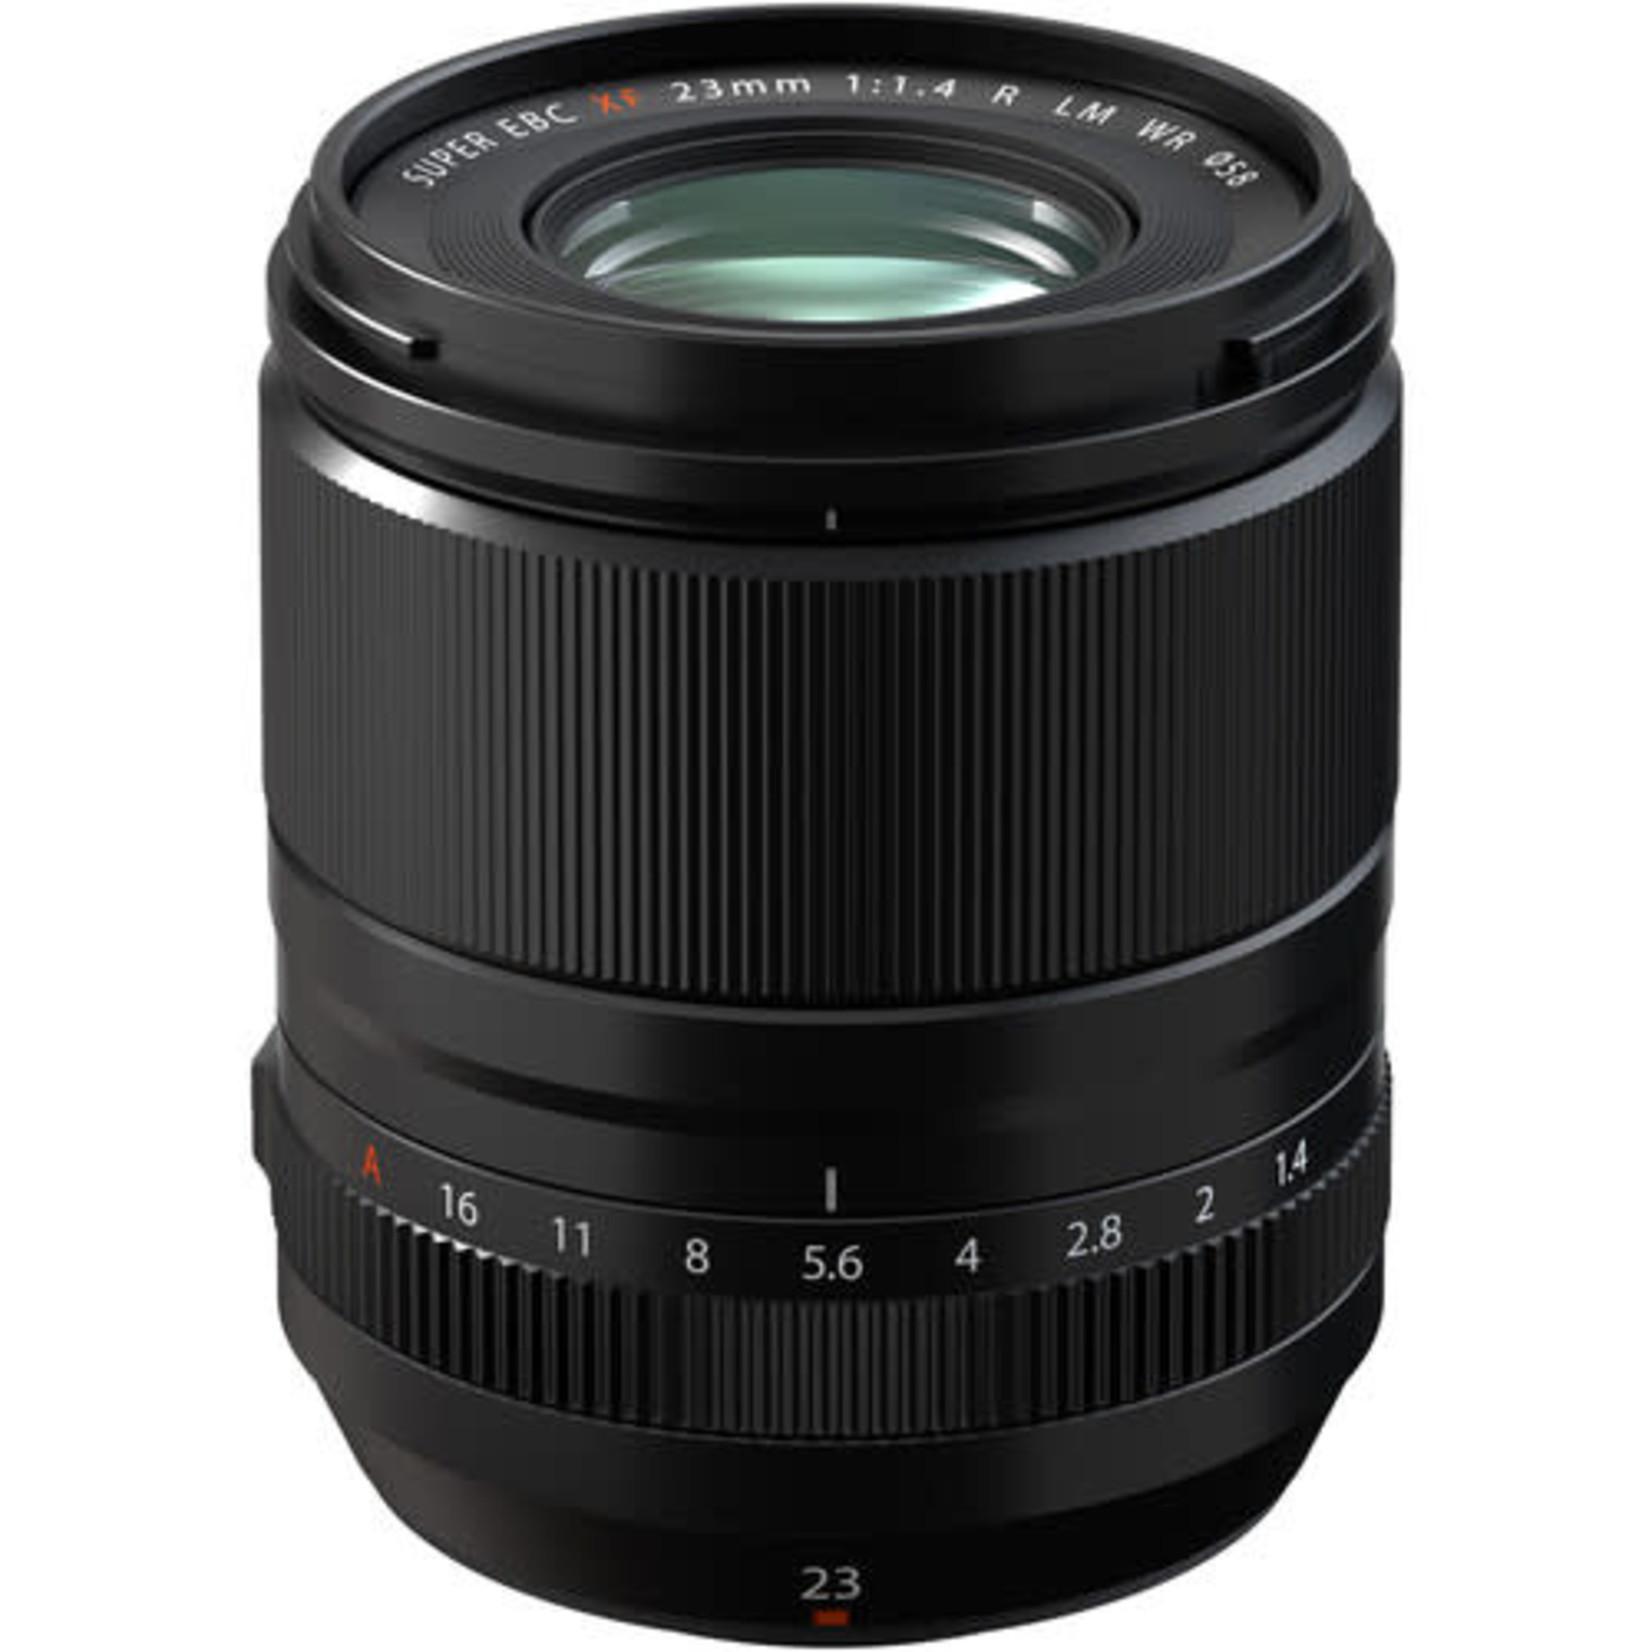 FujiFilm FUJIFILM XF 23mm f/1.4 R LM WR Lens